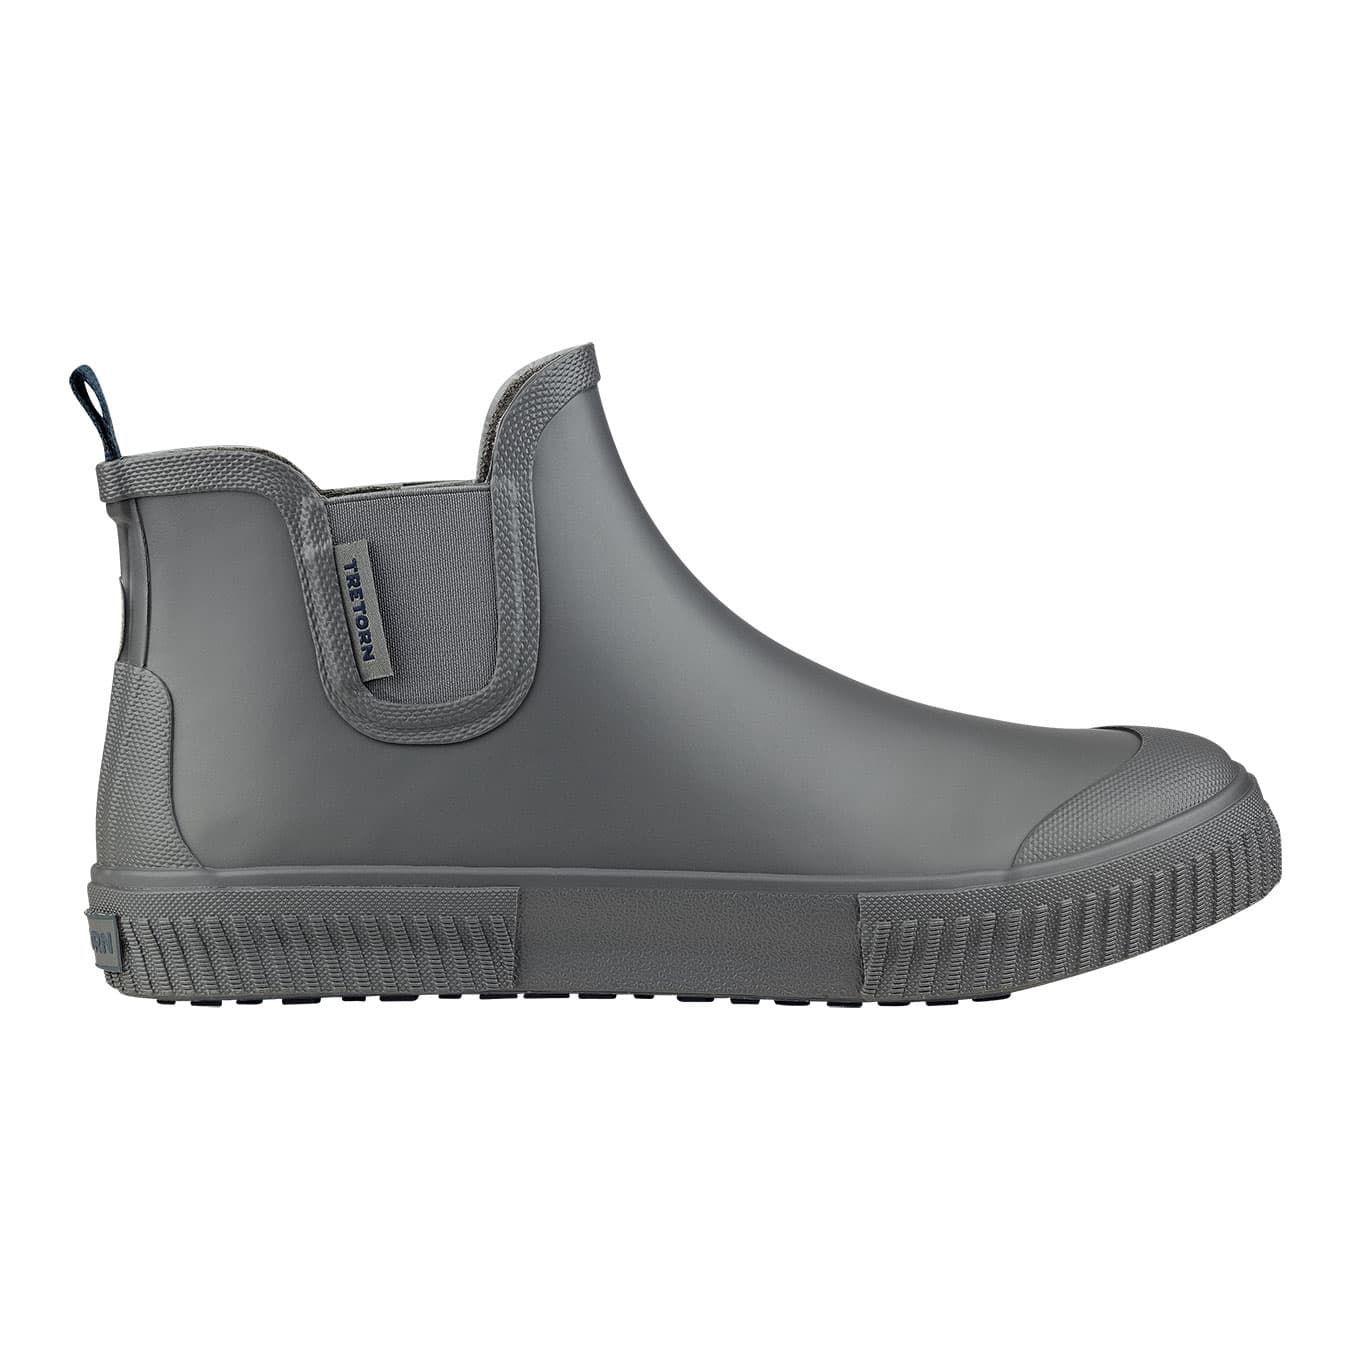 Gus Men Winter Boots Boots Chelsea Boots